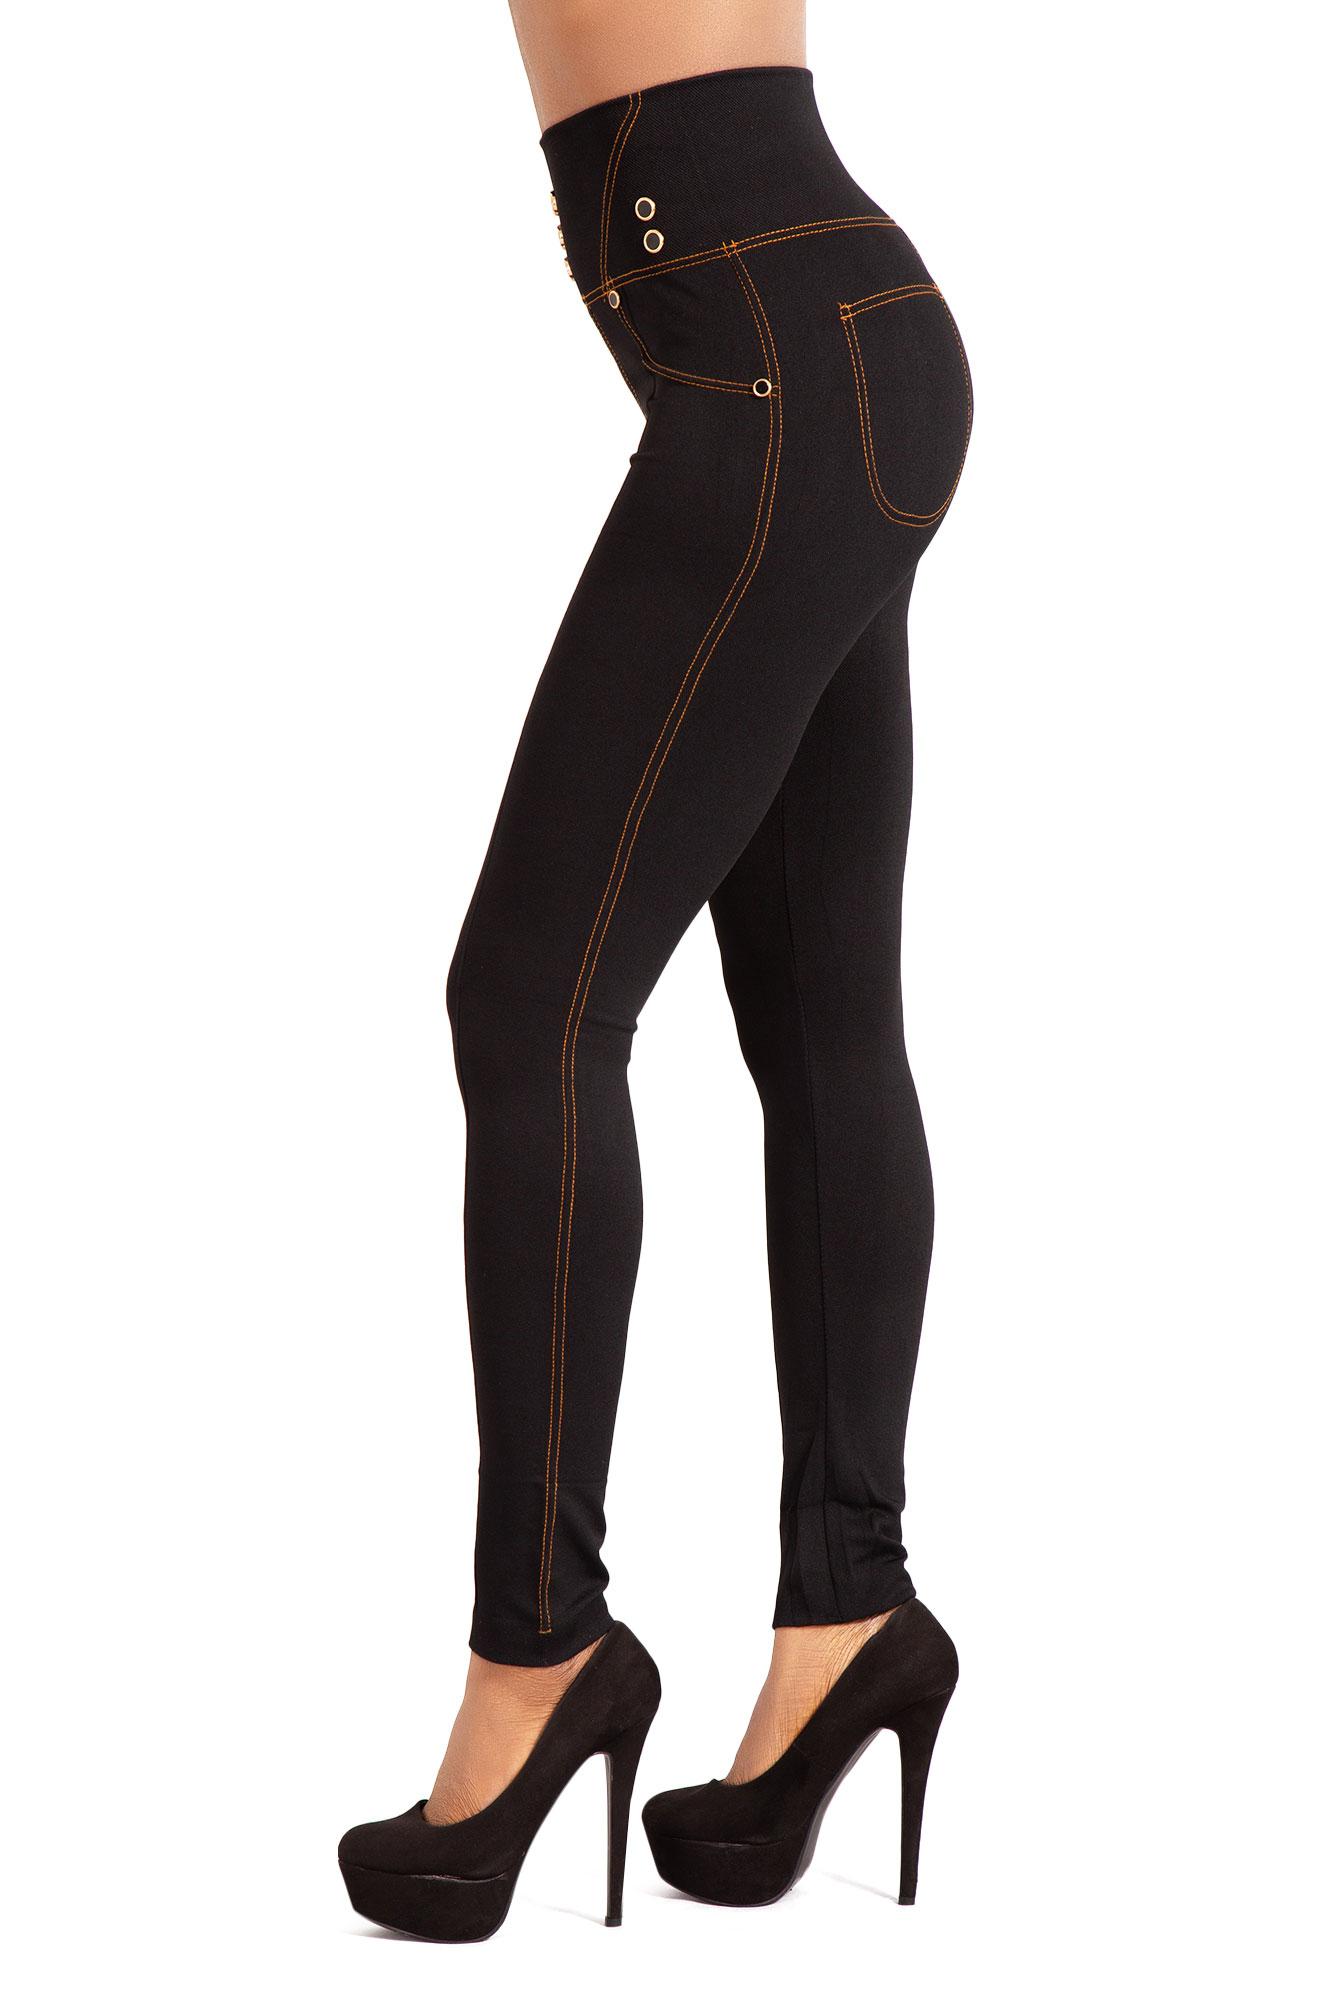 Women-High-Waist-Black-Leggings-Ladies-Print-Jeggings-Style-Trousers thumbnail 13